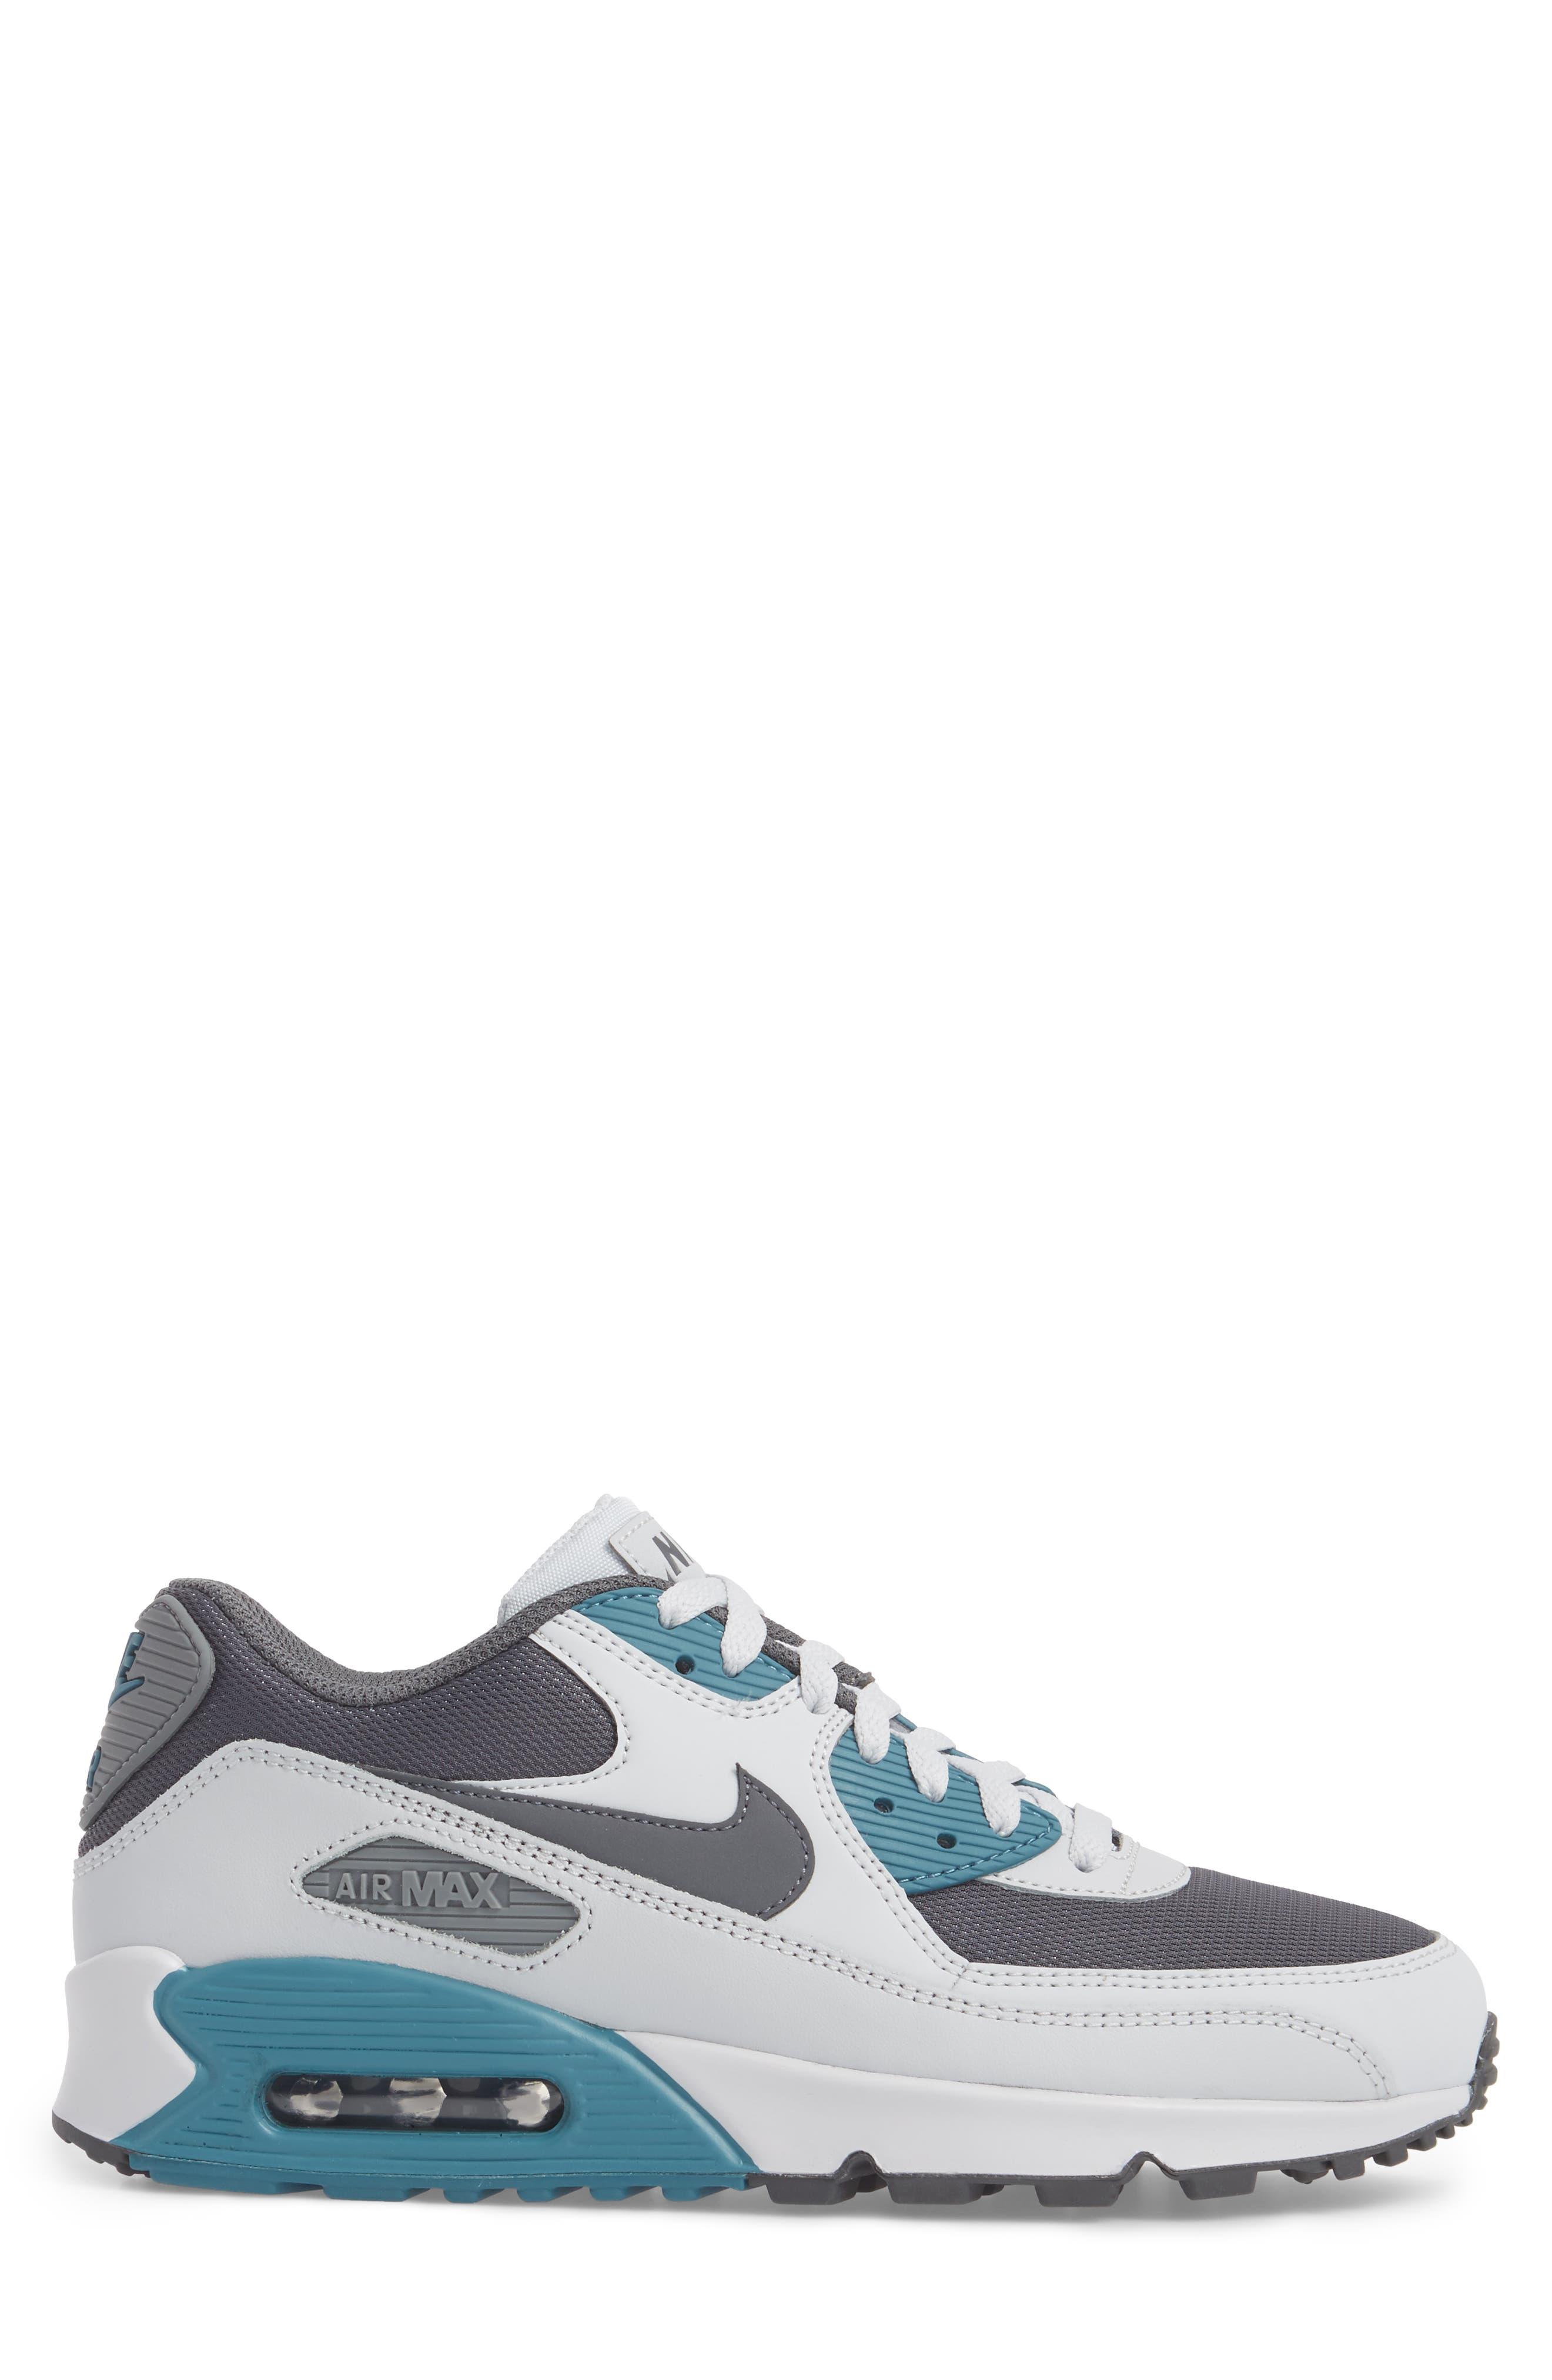 'Air Max 90 Essential' Sneaker,                             Alternate thumbnail 3, color,                             Pure Platinum/ Cool Grey/ Aqua